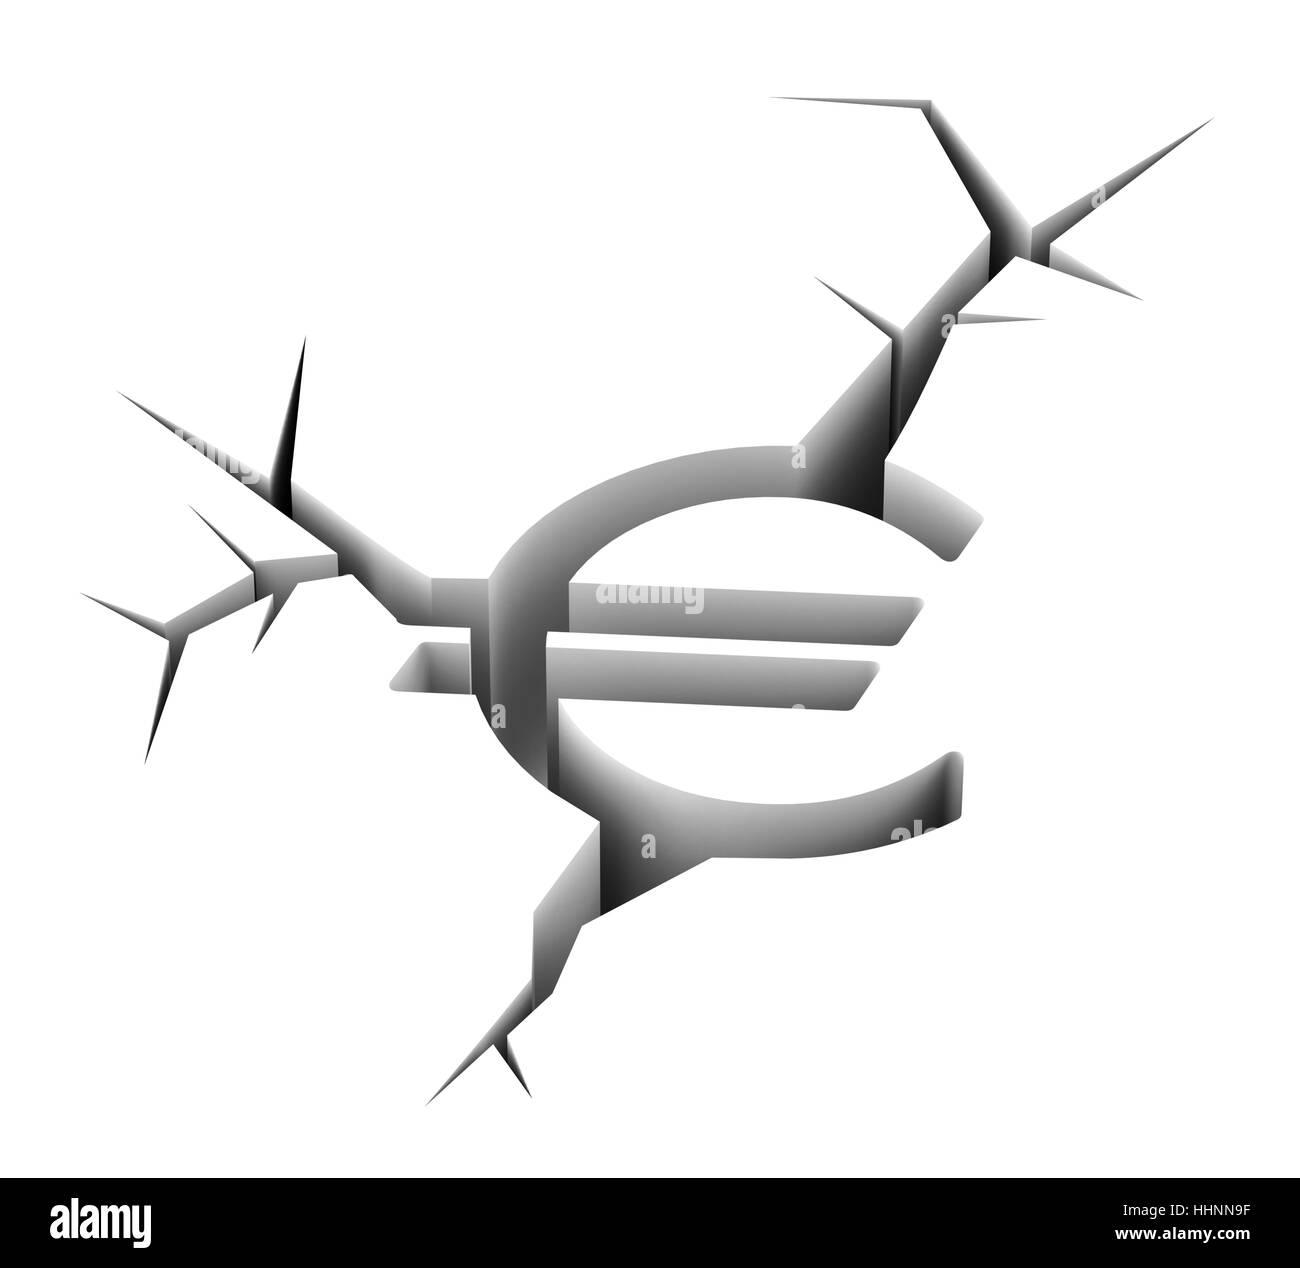 currency, stock exchange, stock-exchange, emporium, center of trade, market, - Stock Image